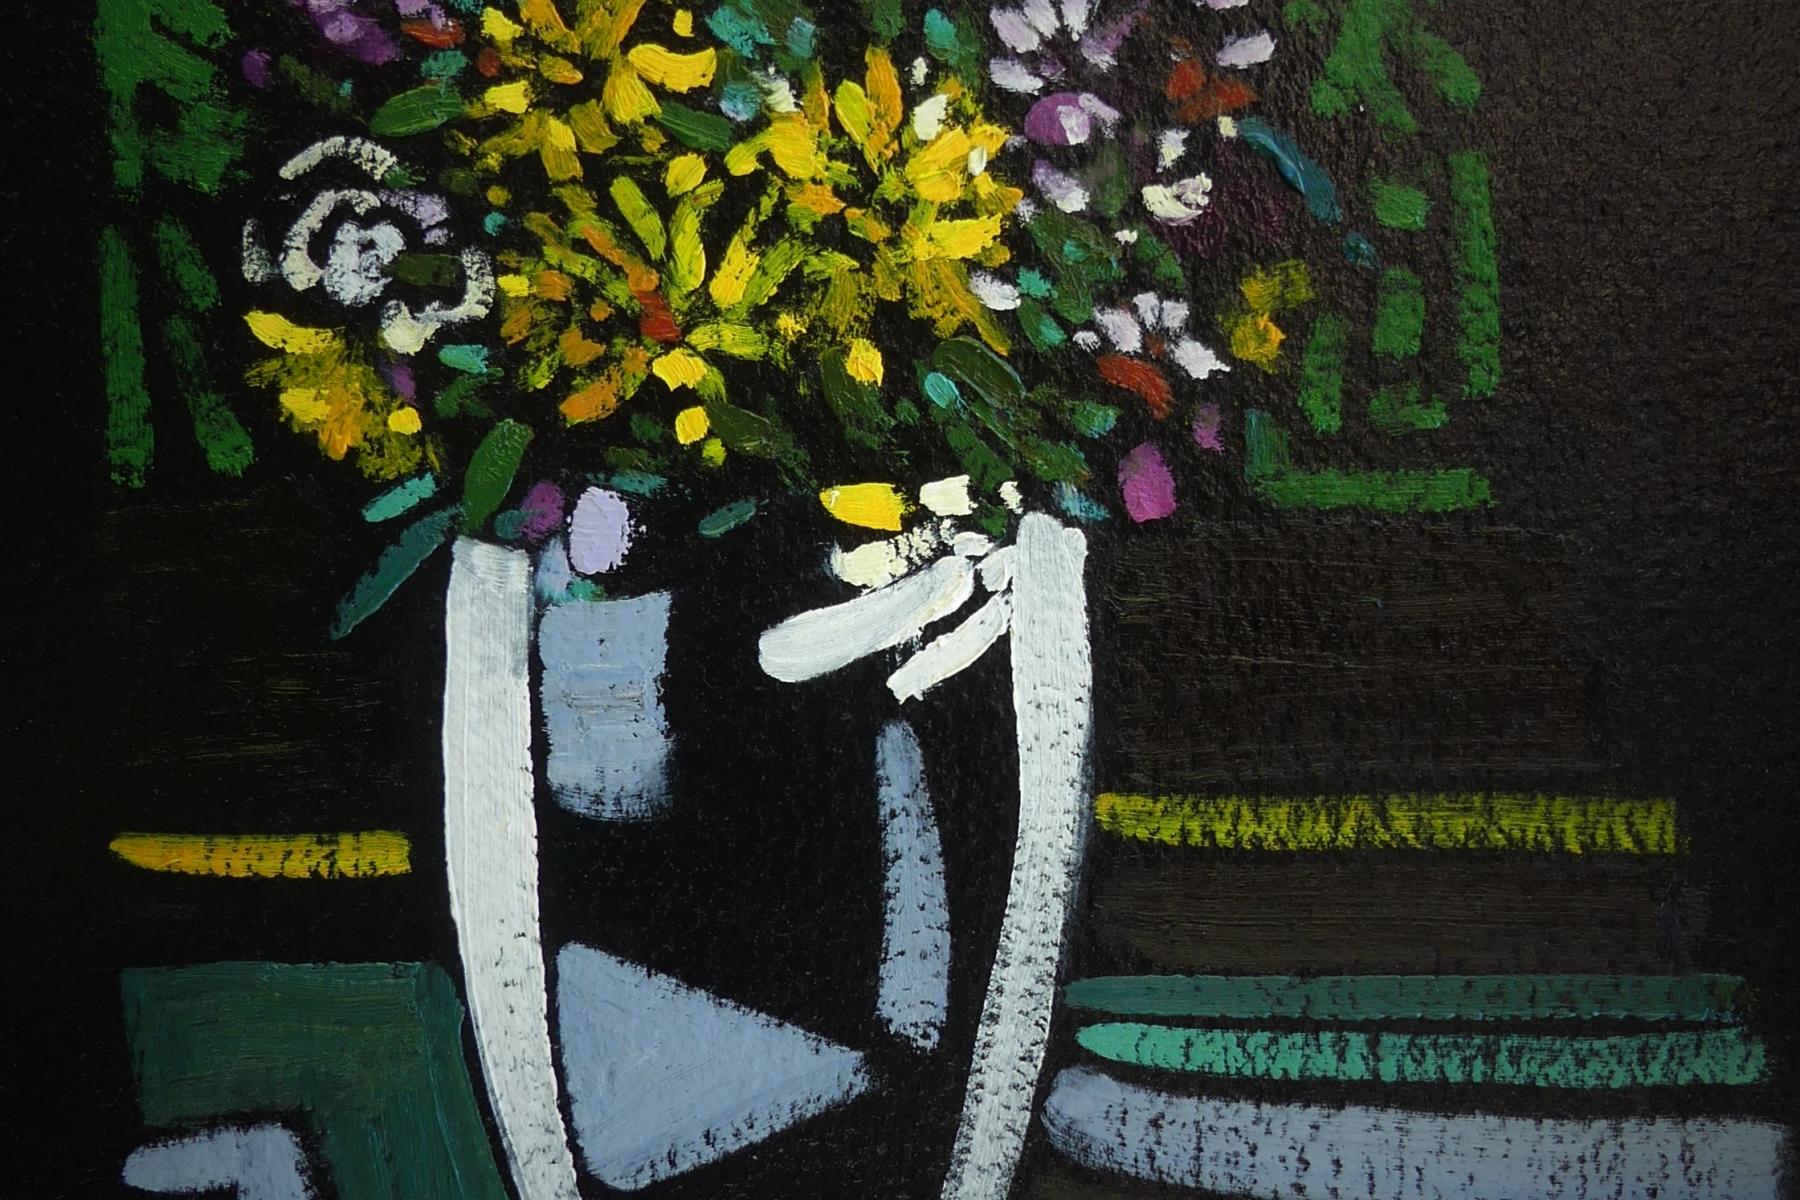 White Vase | Modern Contemporary Still Life | Artist Painter Kim Pollard | Canada |